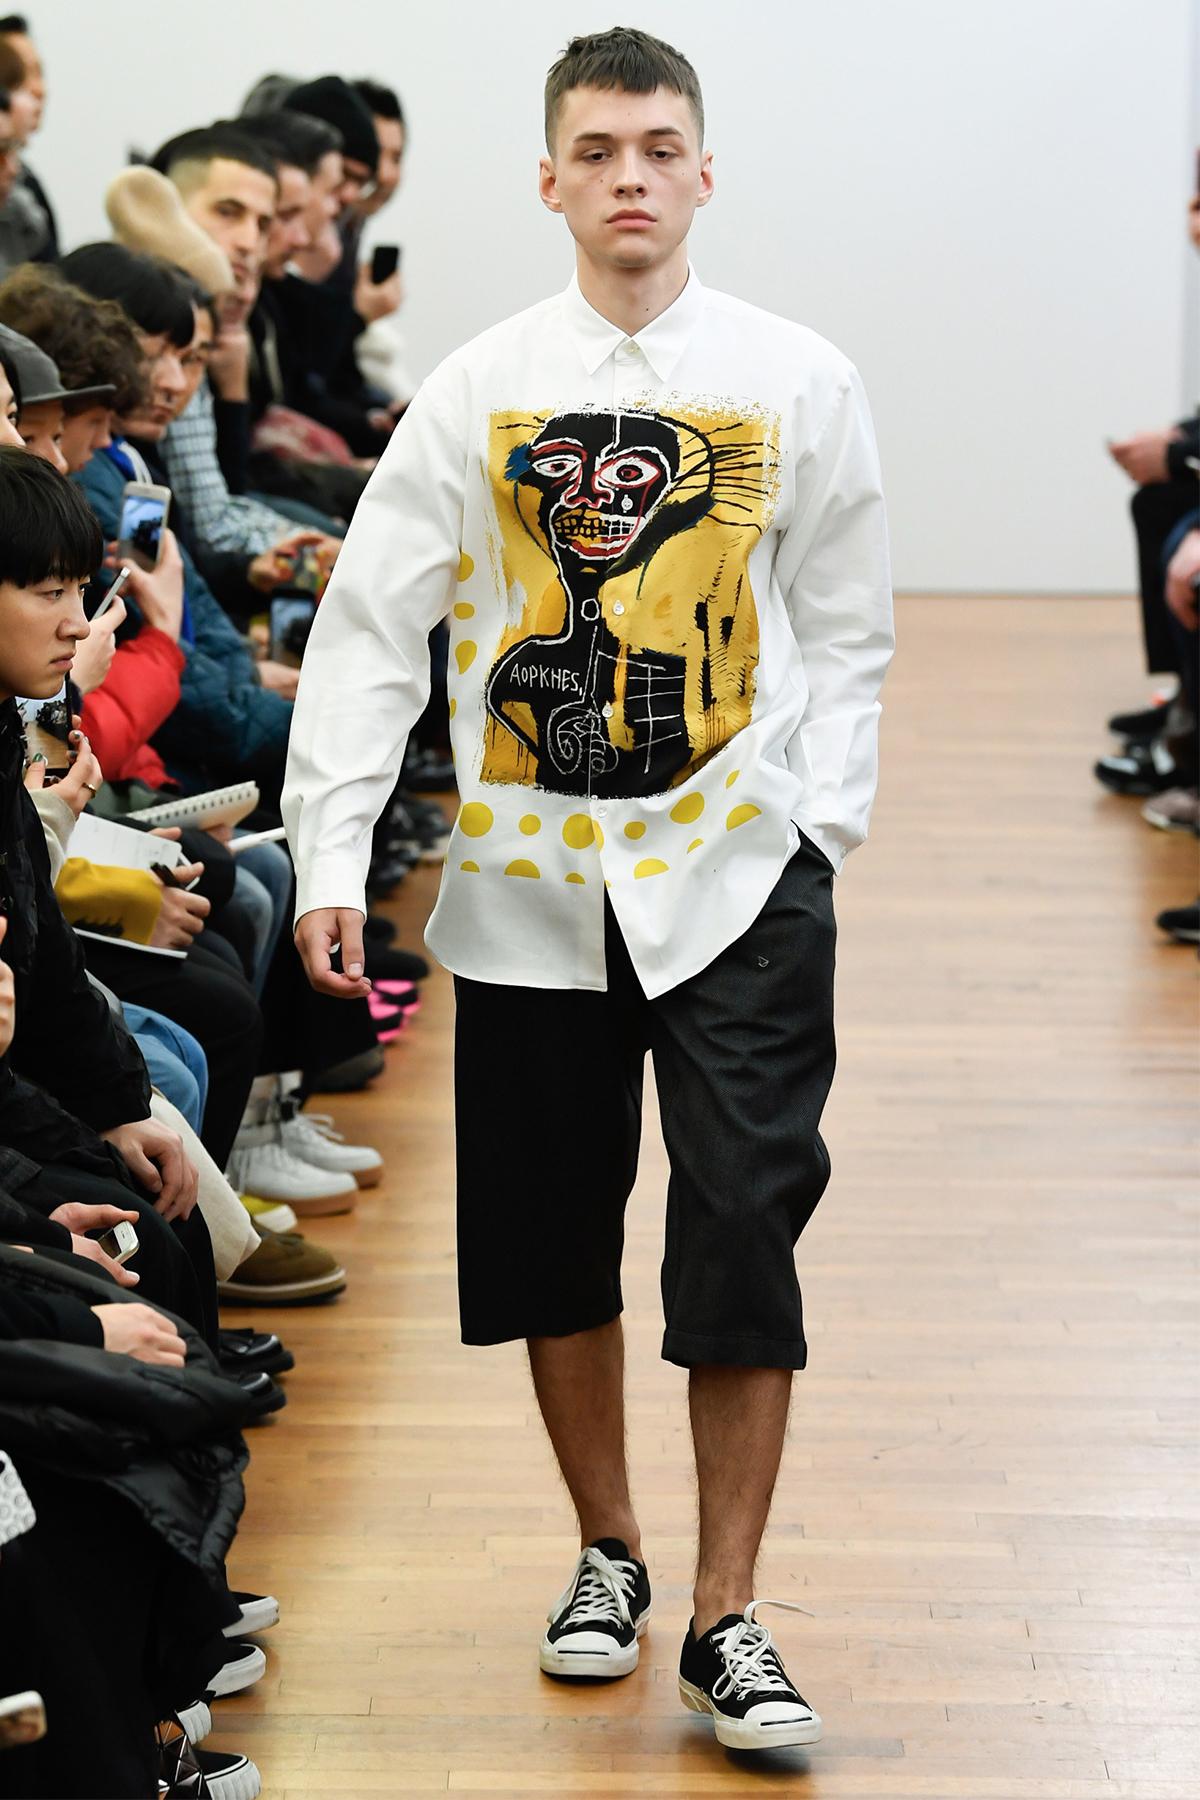 Artestar_Basquiat_CommeDesGarconsShirt_8.jpg